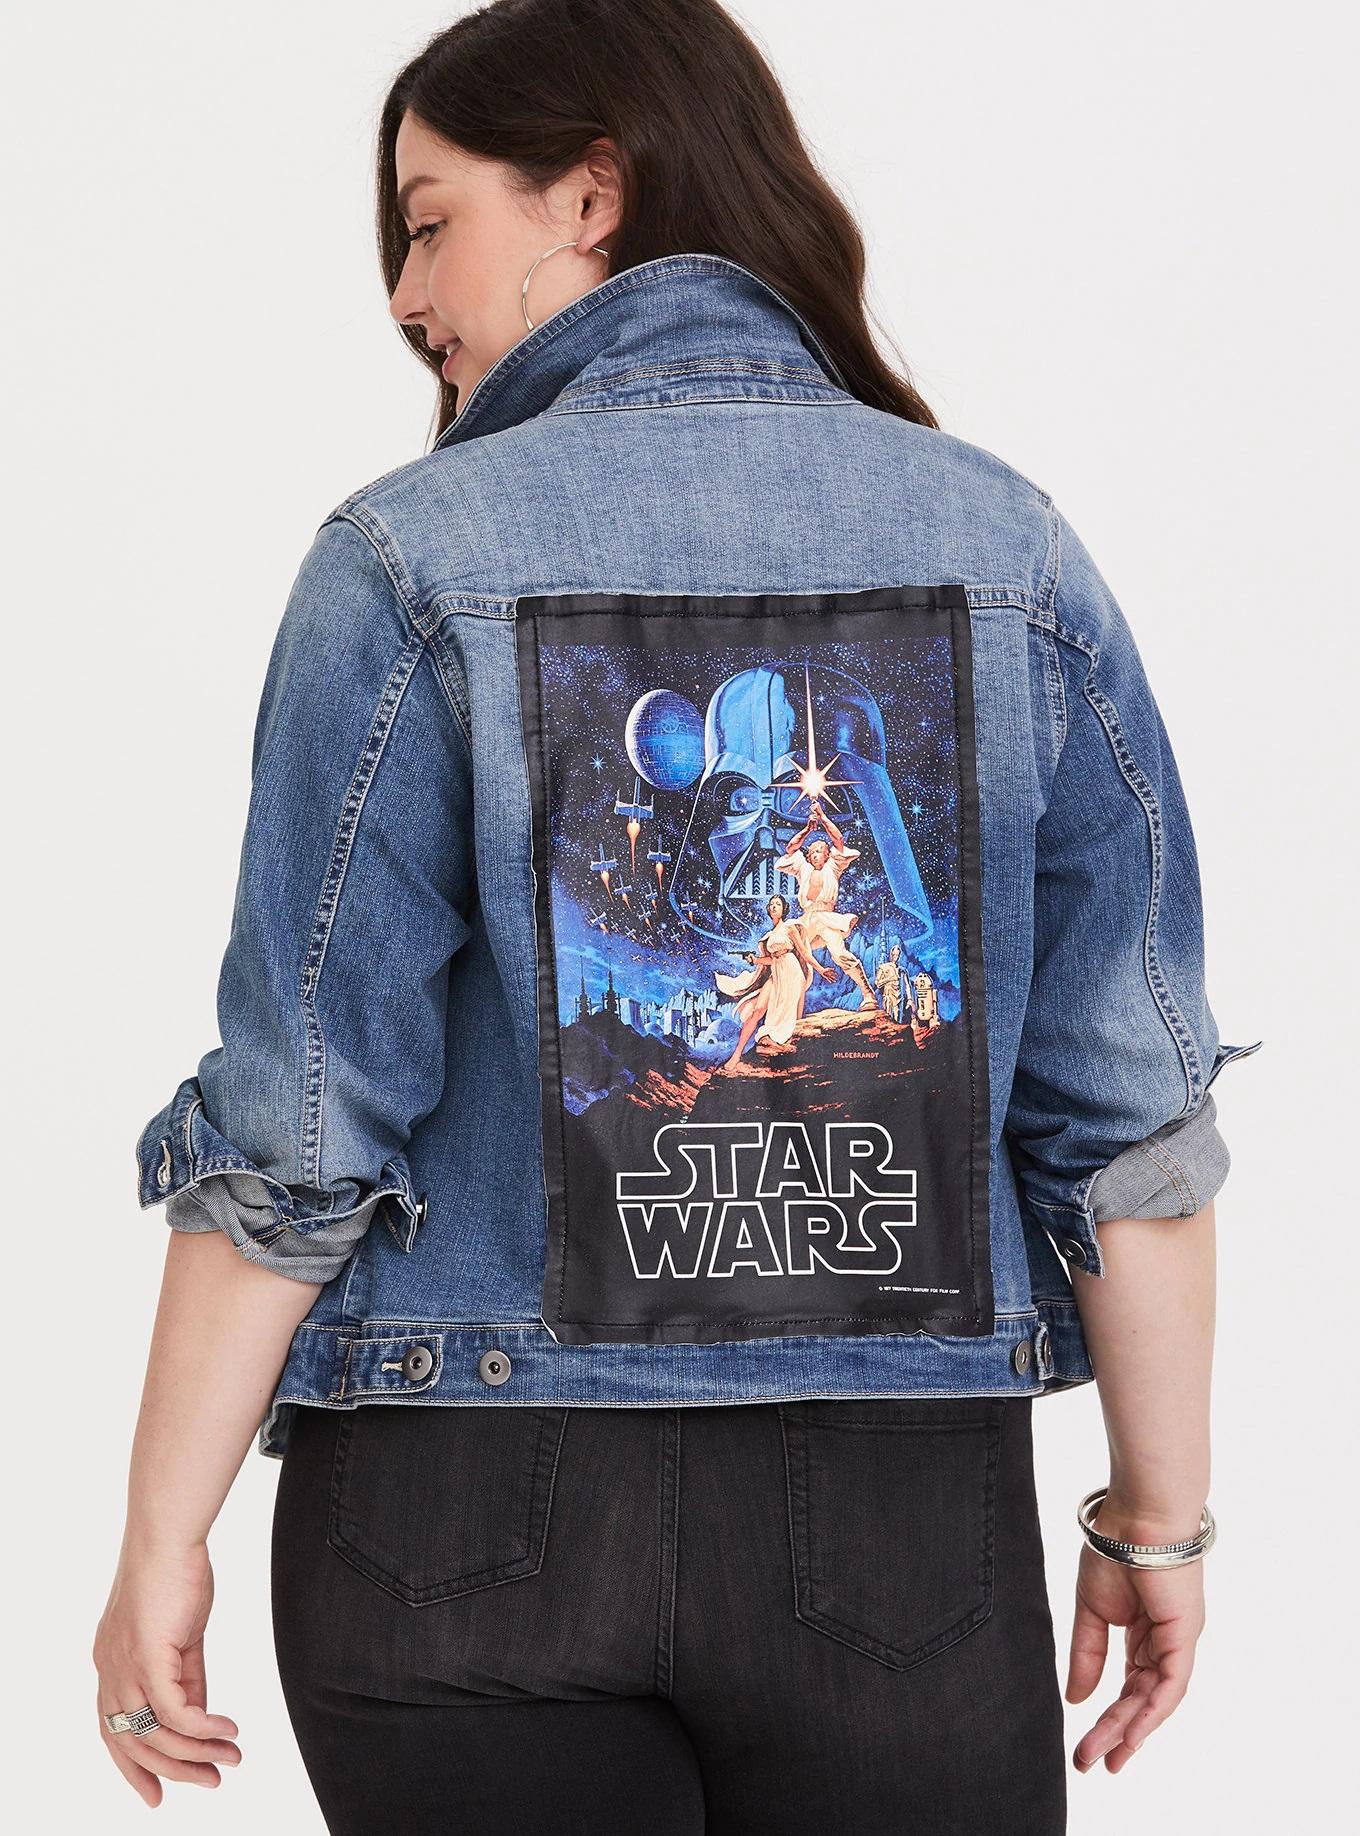 35f11172cc4 ... Women s Her Universe x Star Wars Patch Plus Size Jean Jacket at Torrid